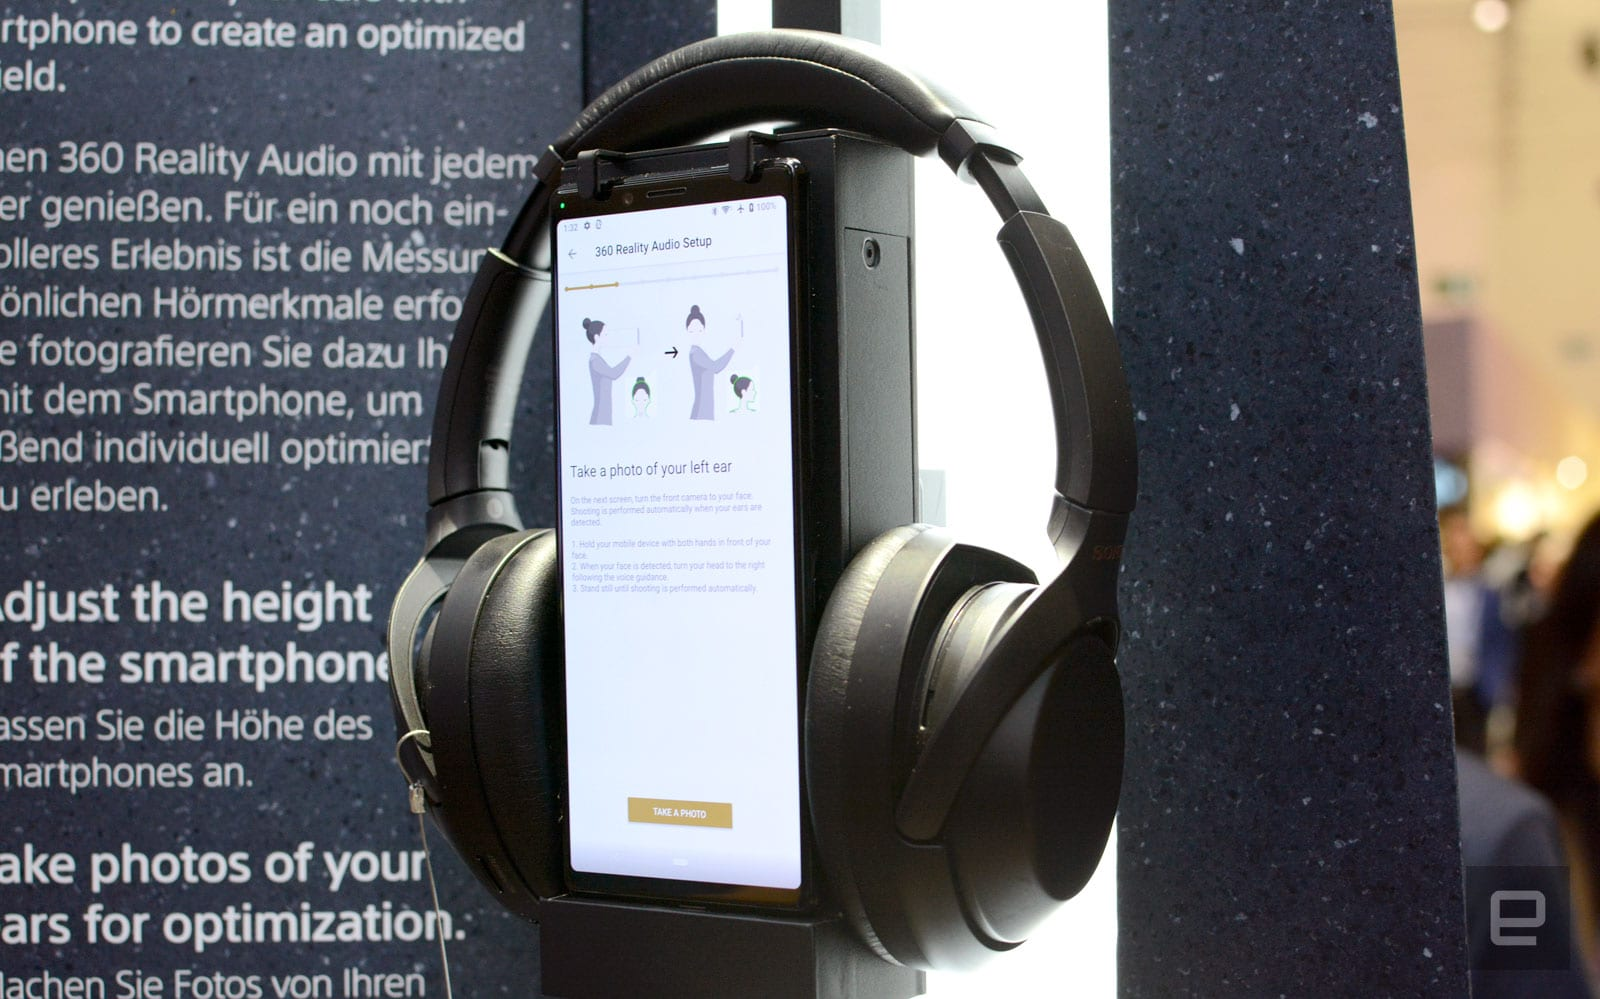 Sony 360 Reality Audio sound profiles